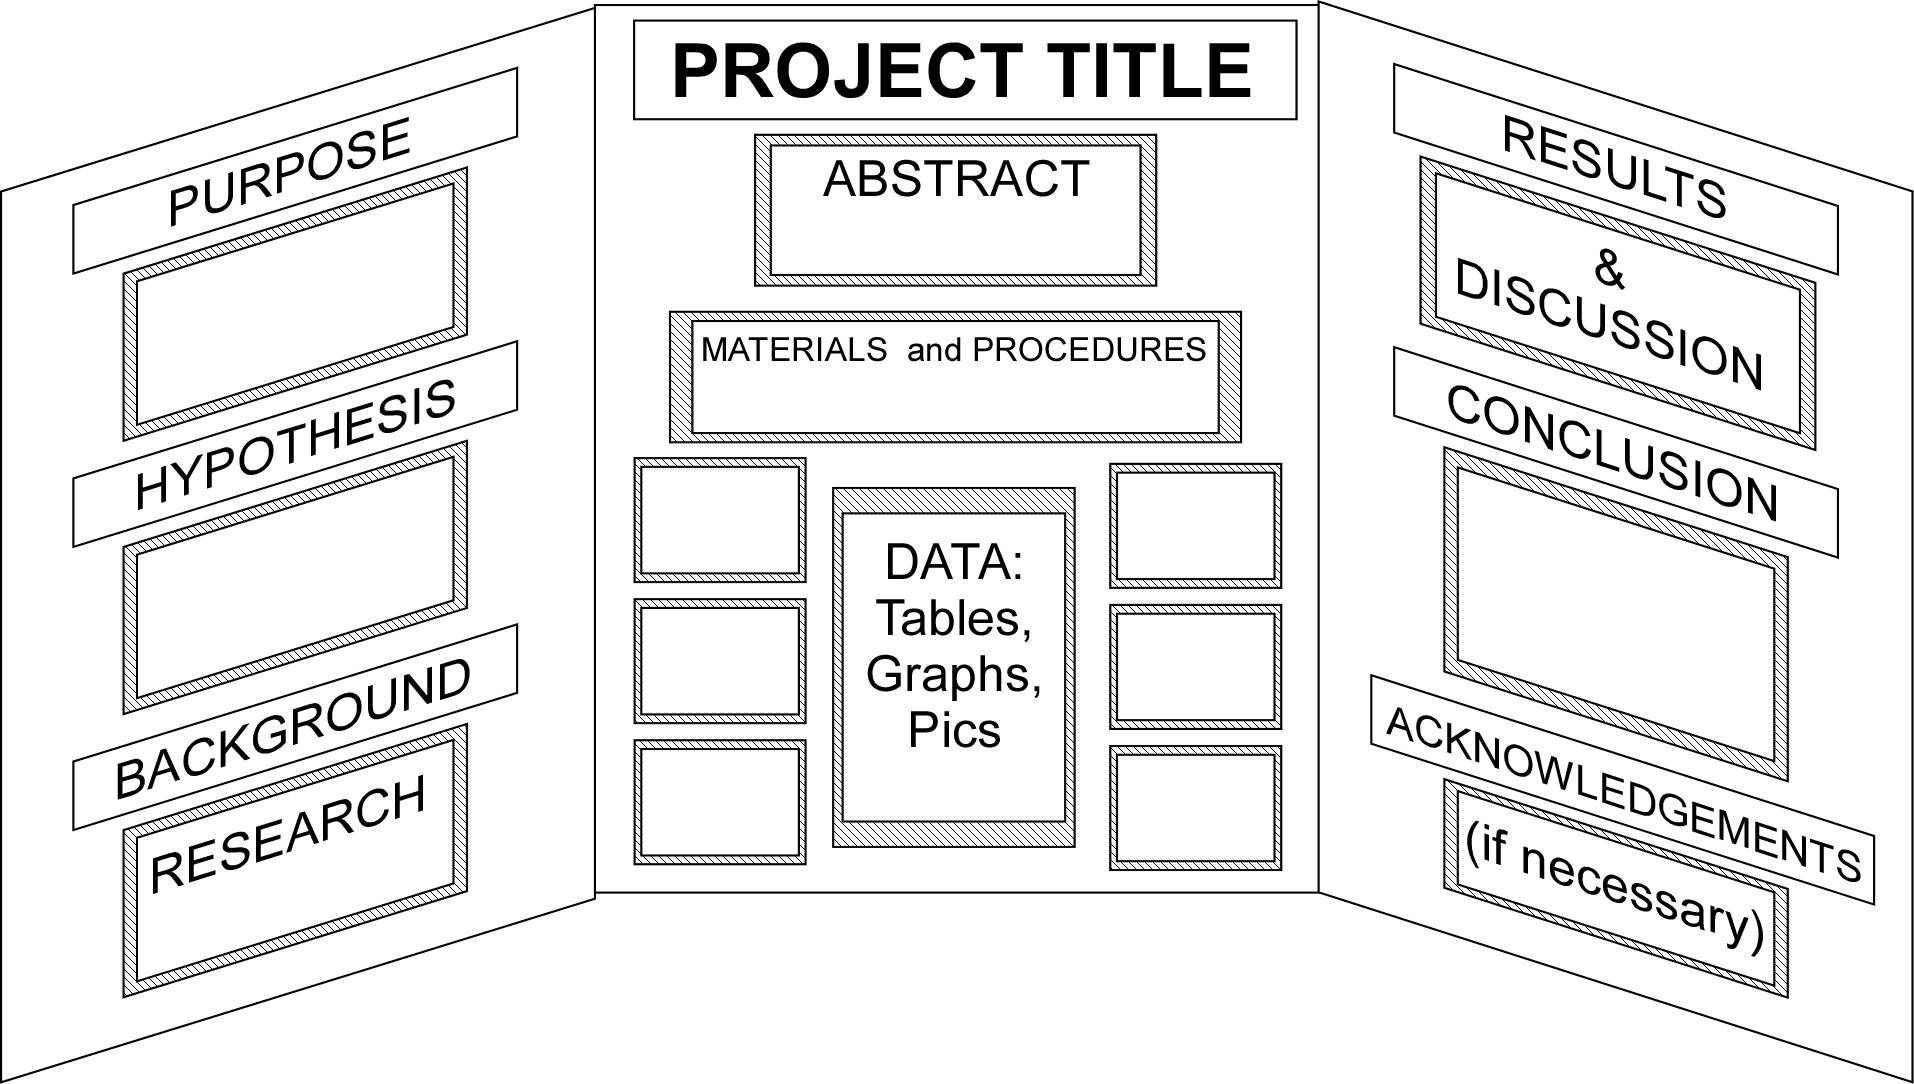 Pinsara Johnson On Science Fair Project Ideas | Science Fair - Free Printable Science Fair Project Board Labels